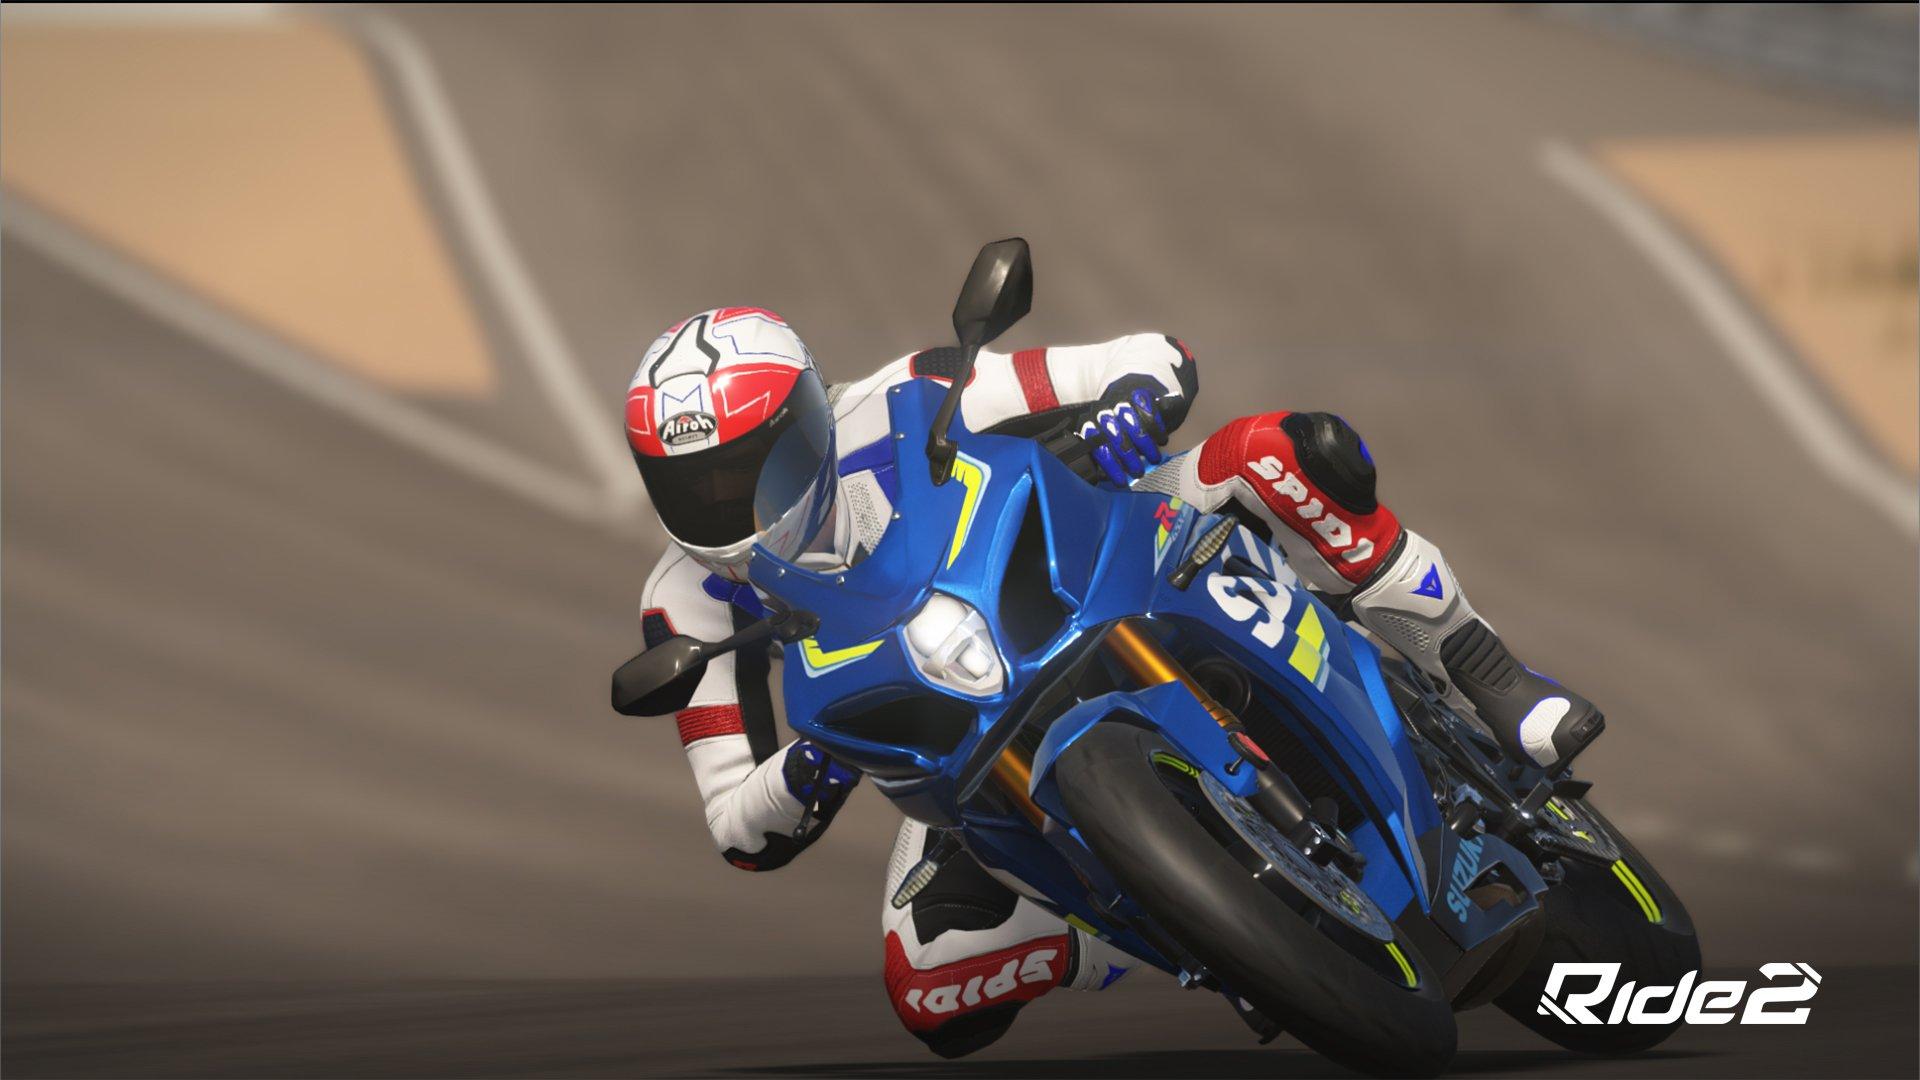 RIDE Archives - Inside Sim Racing